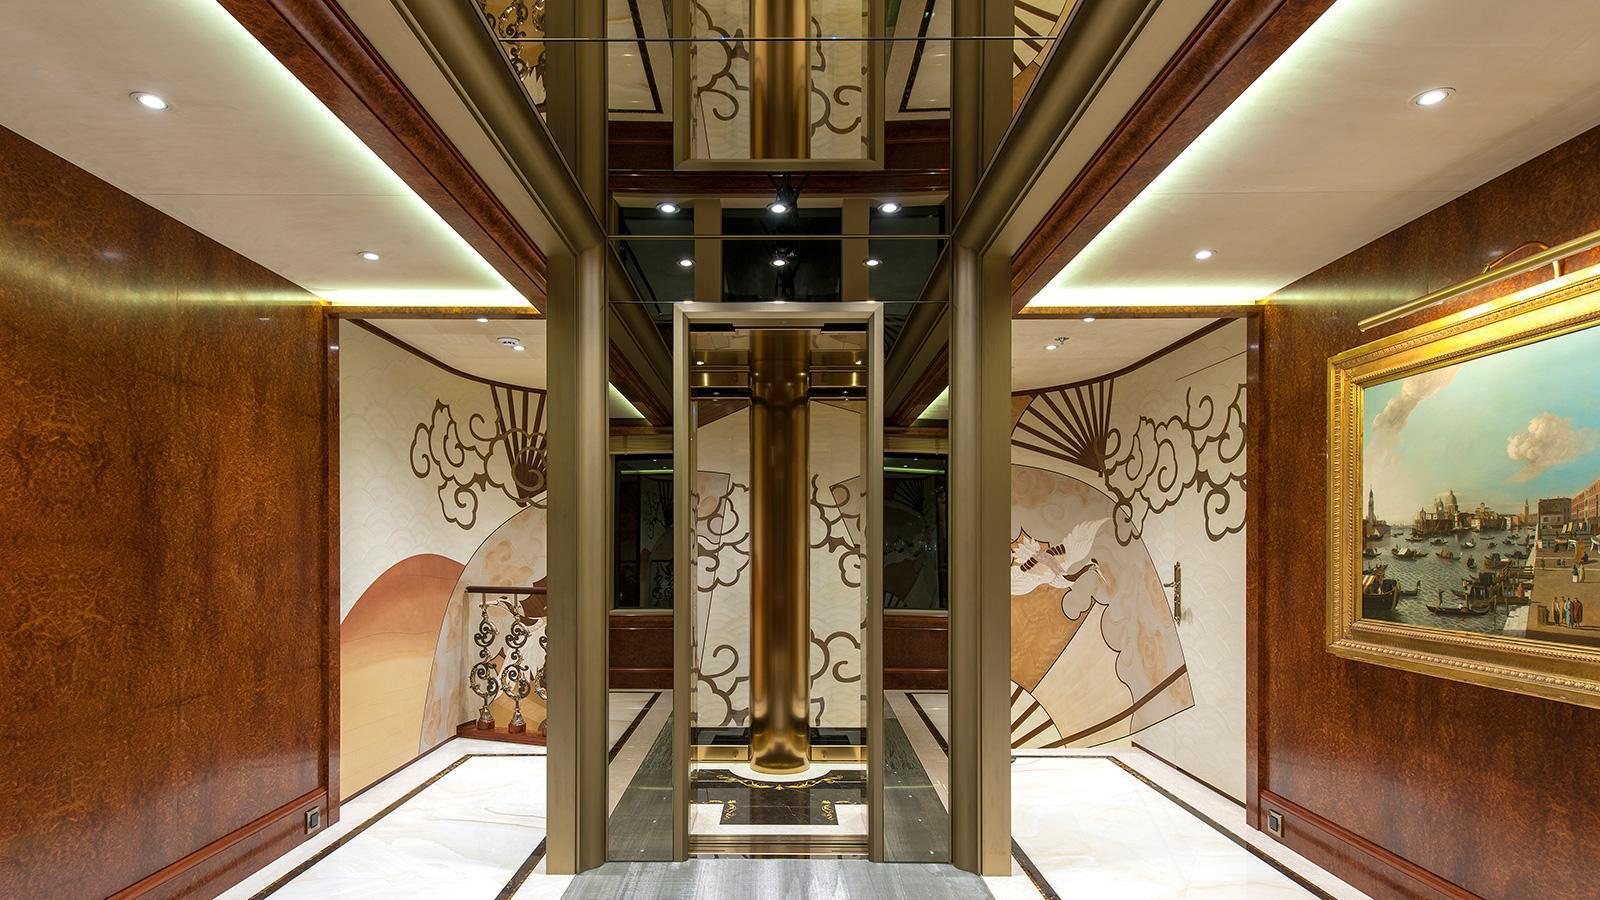 iroquois ester iii motor yacht lurssen 2014 66m lobby